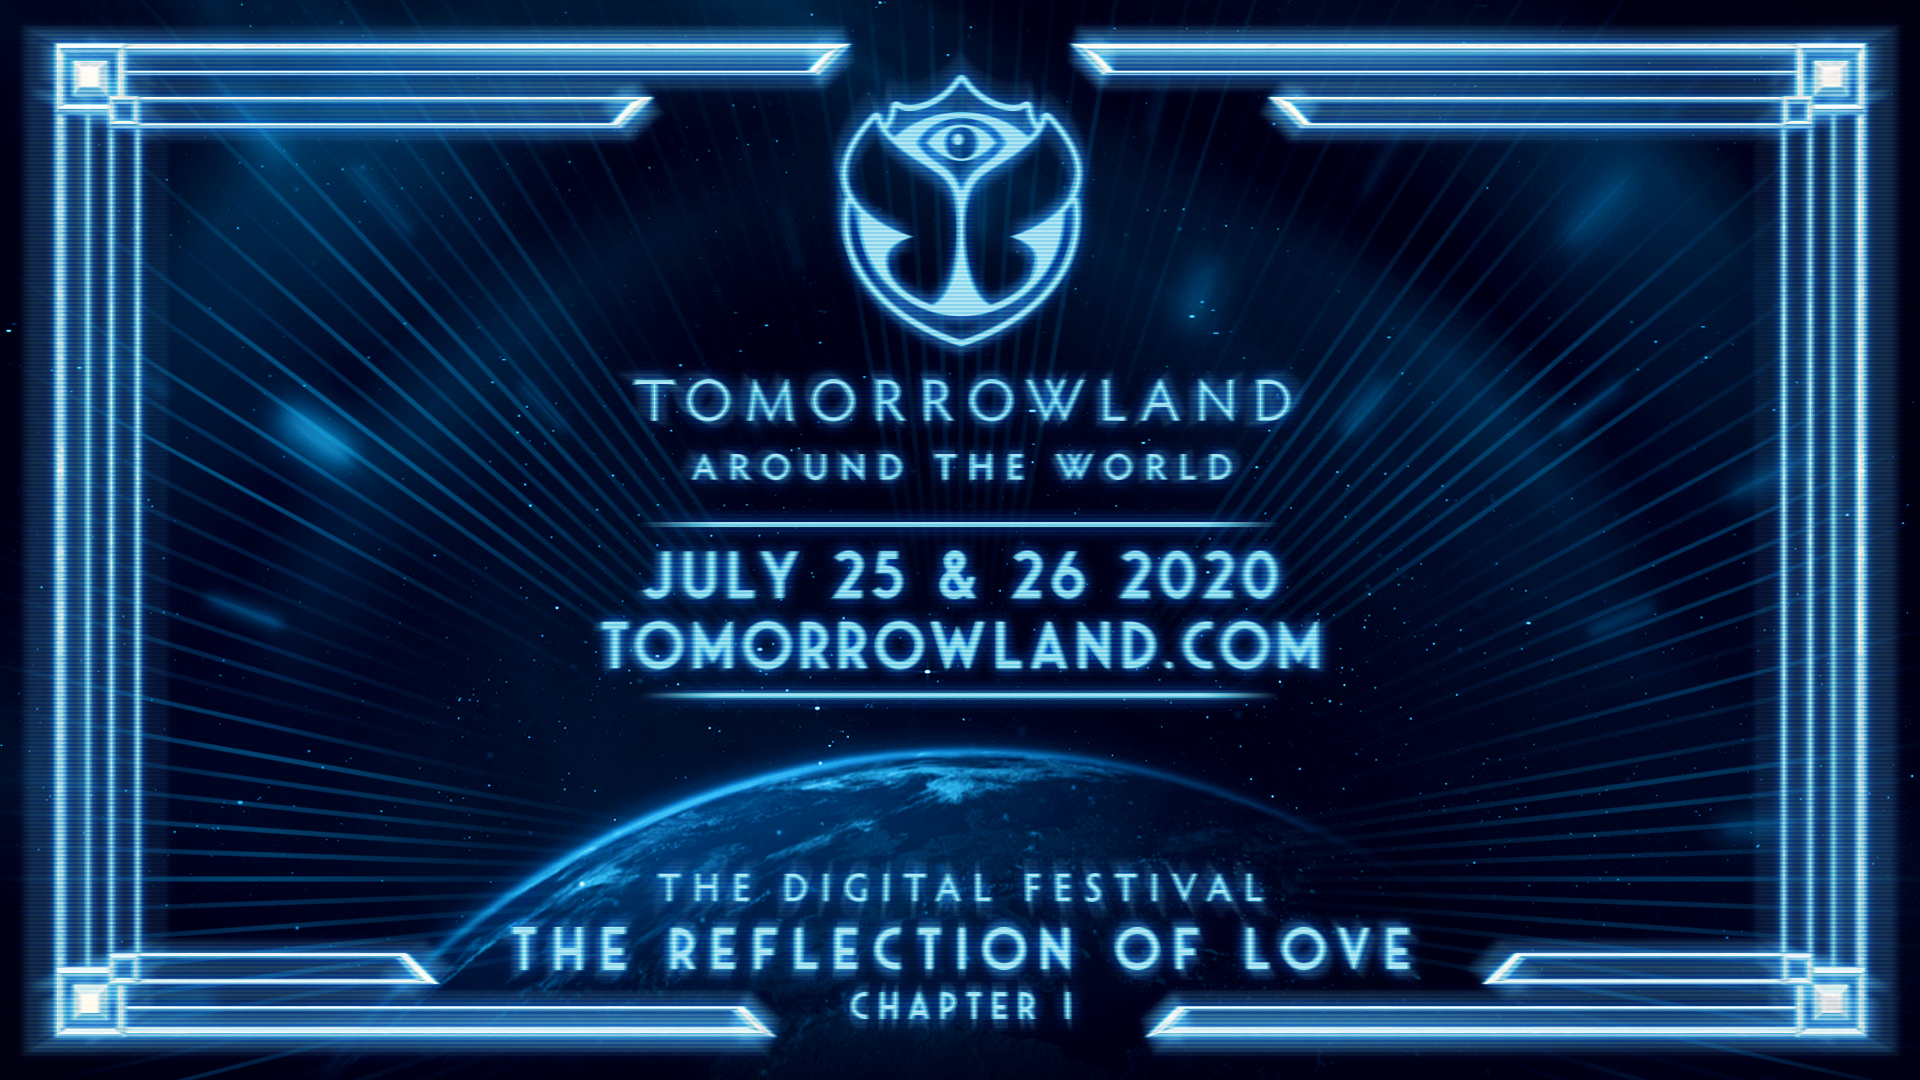 Tomorrowland 2020 will be digital : Around the World